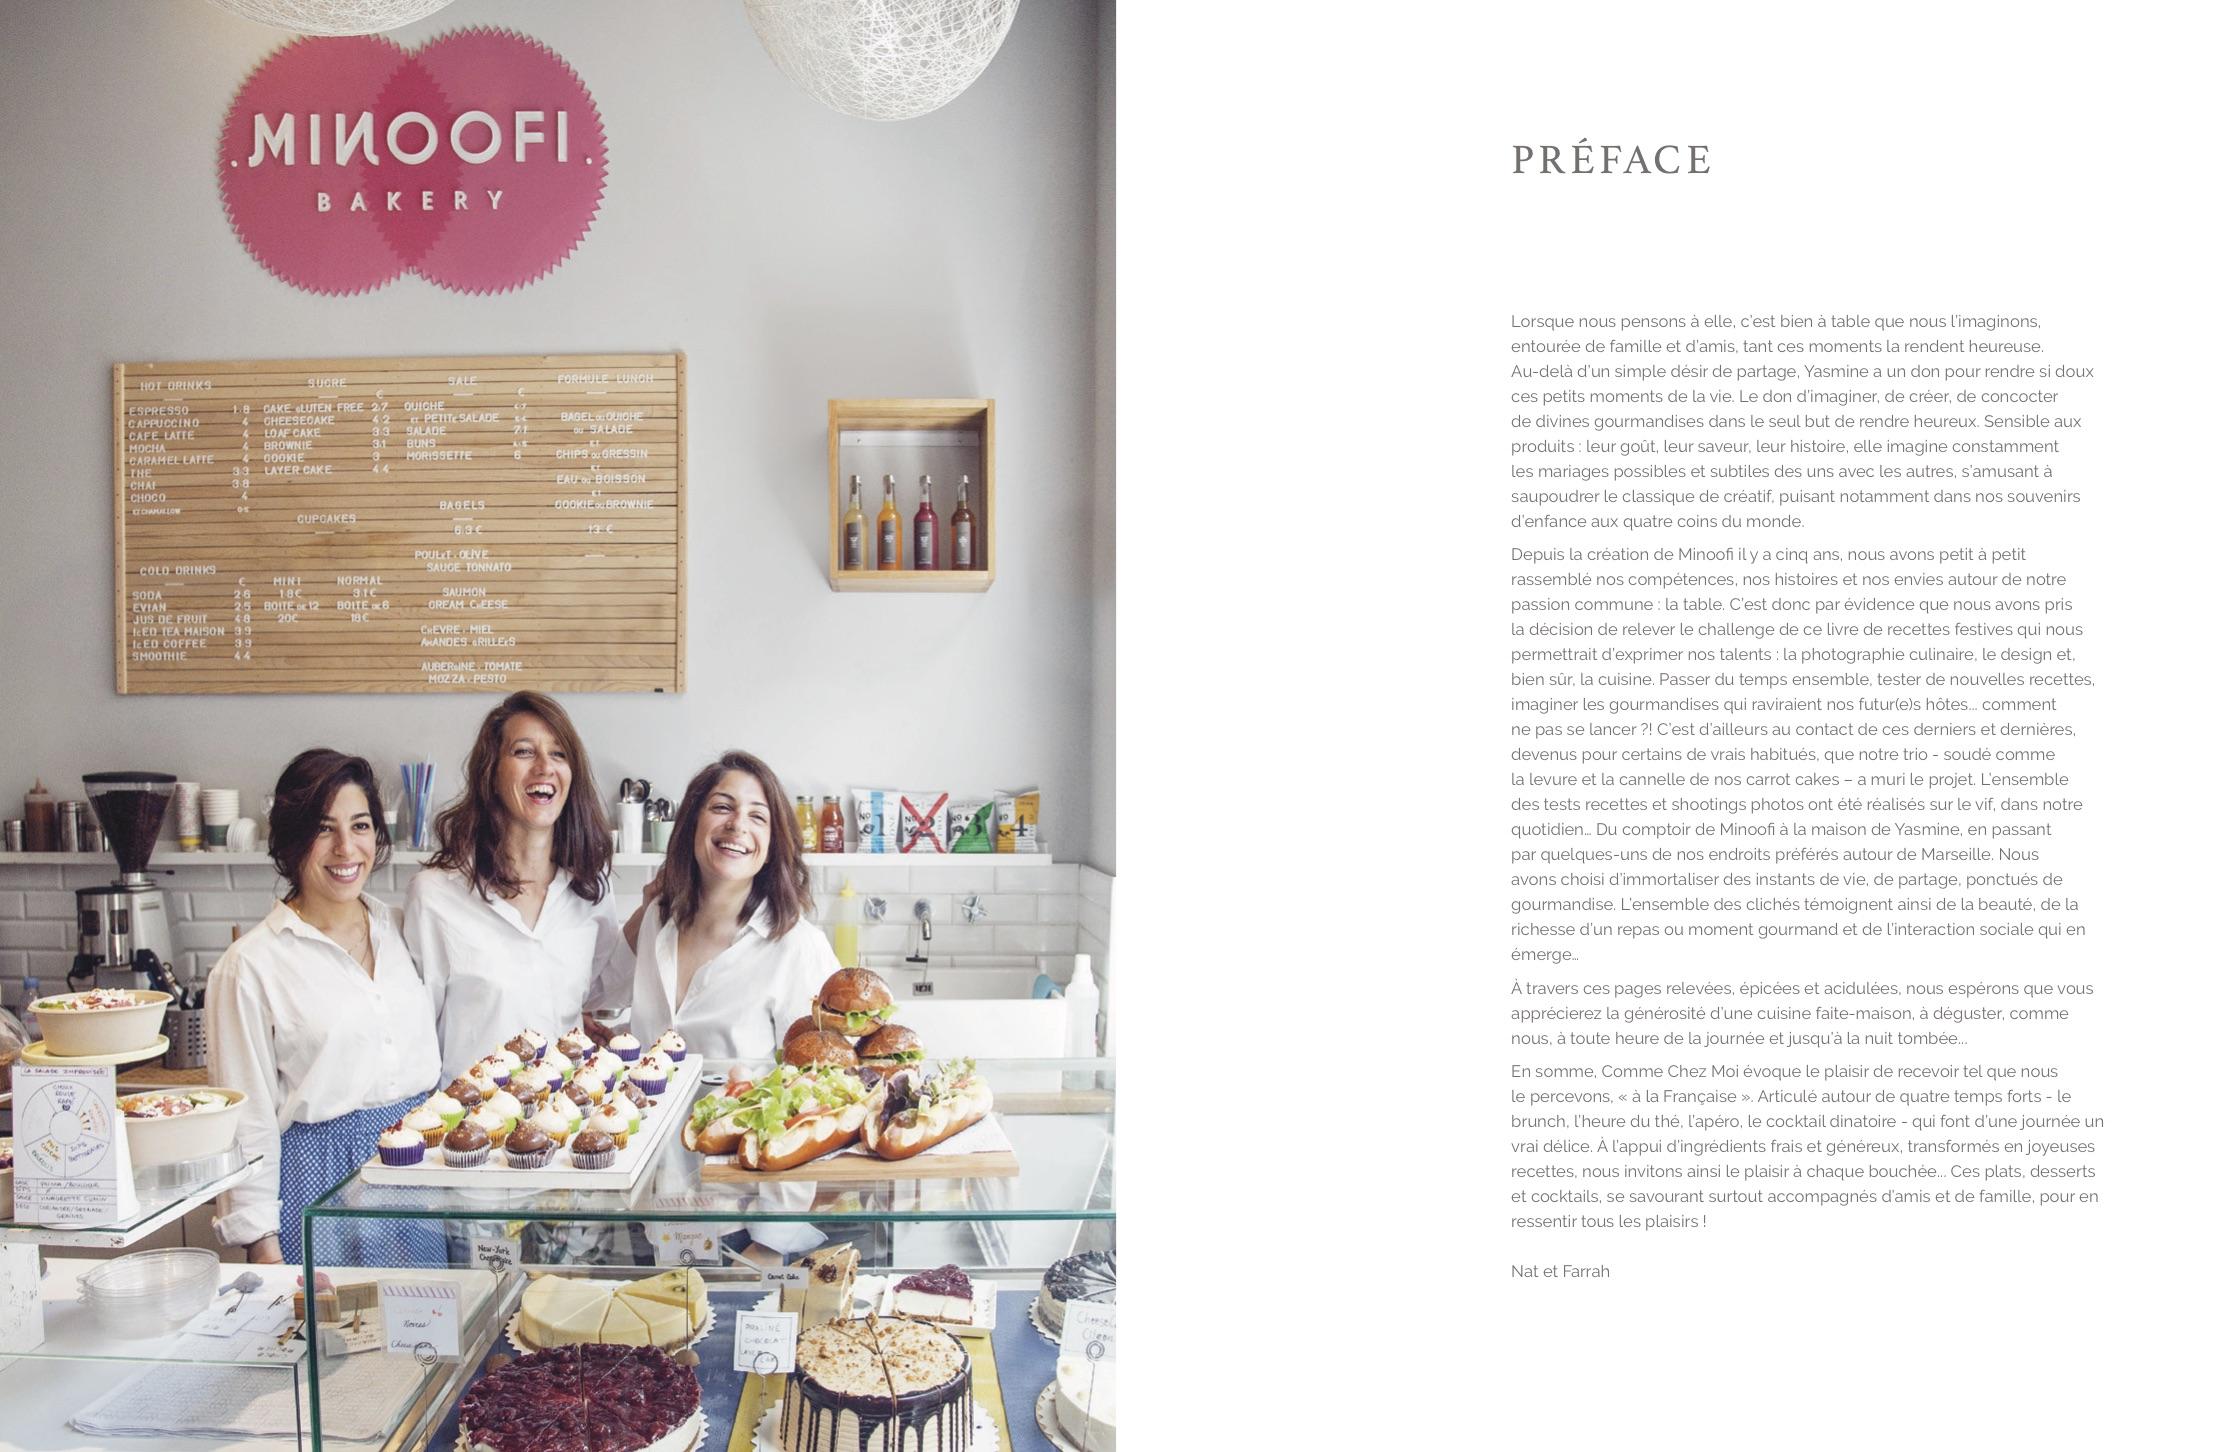 Minoofi Ebook French - Elle copy3.jpg